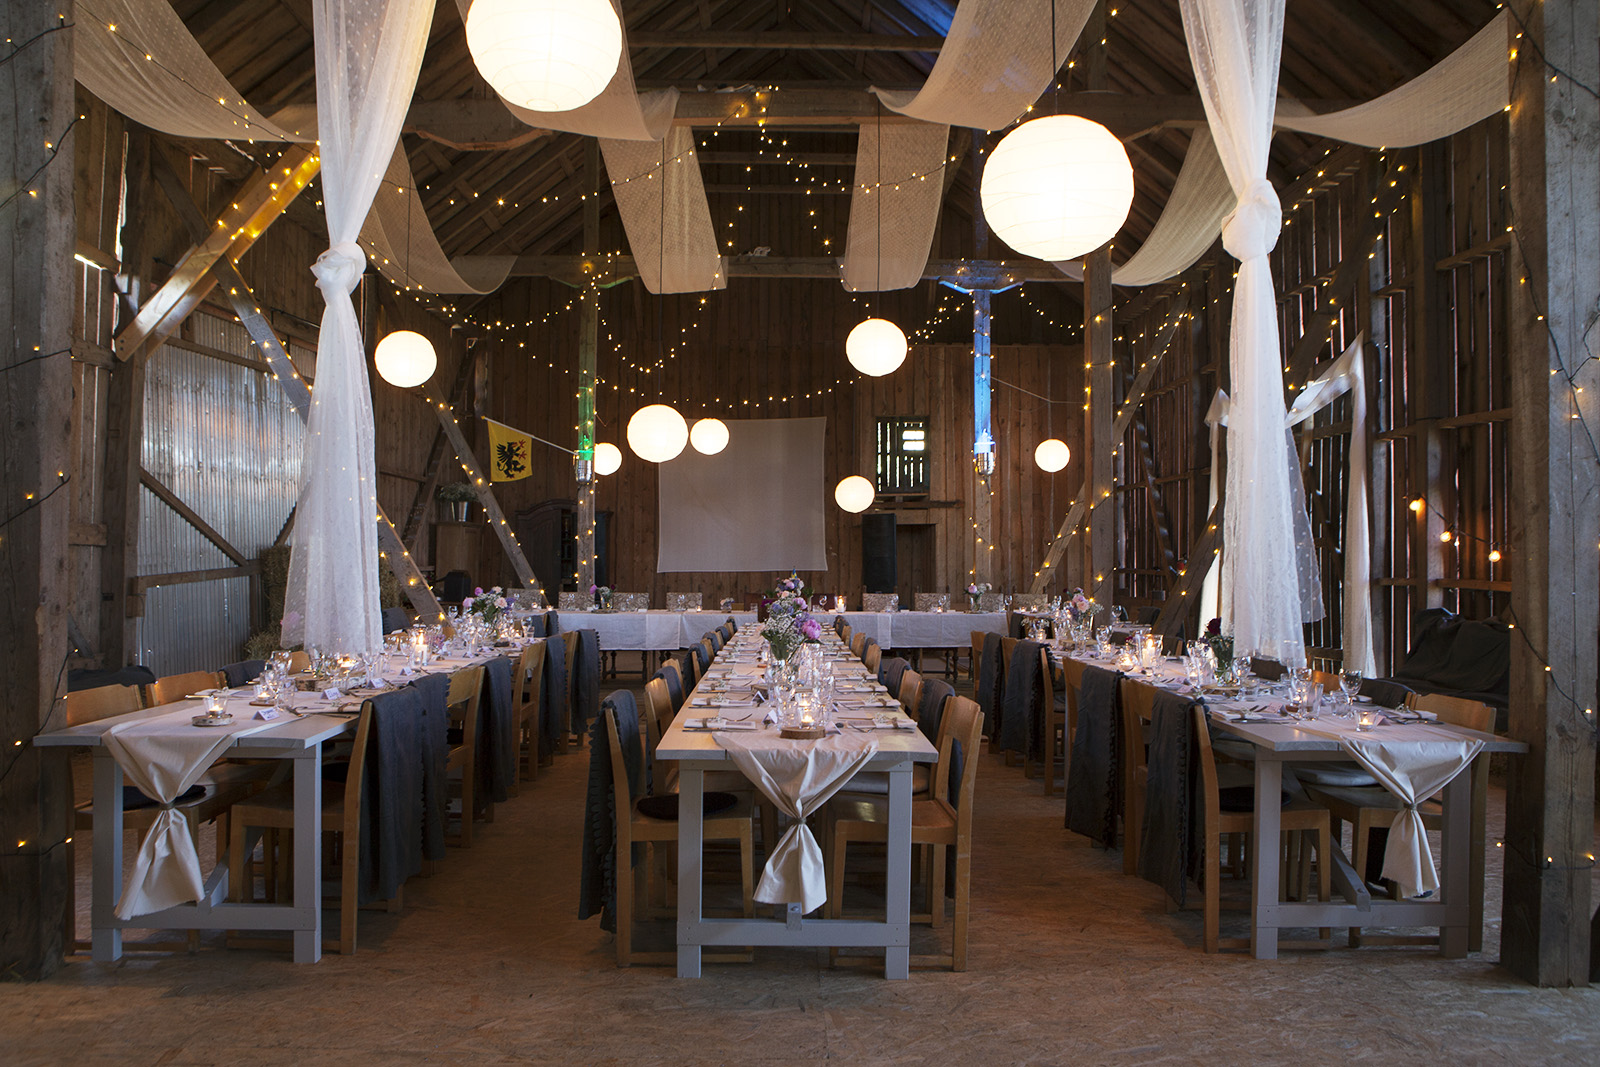 cc2169633d09 Bröllop på landet, bröllopslokal festlokal lokal event södermanland  sörmland nyköping stockholm